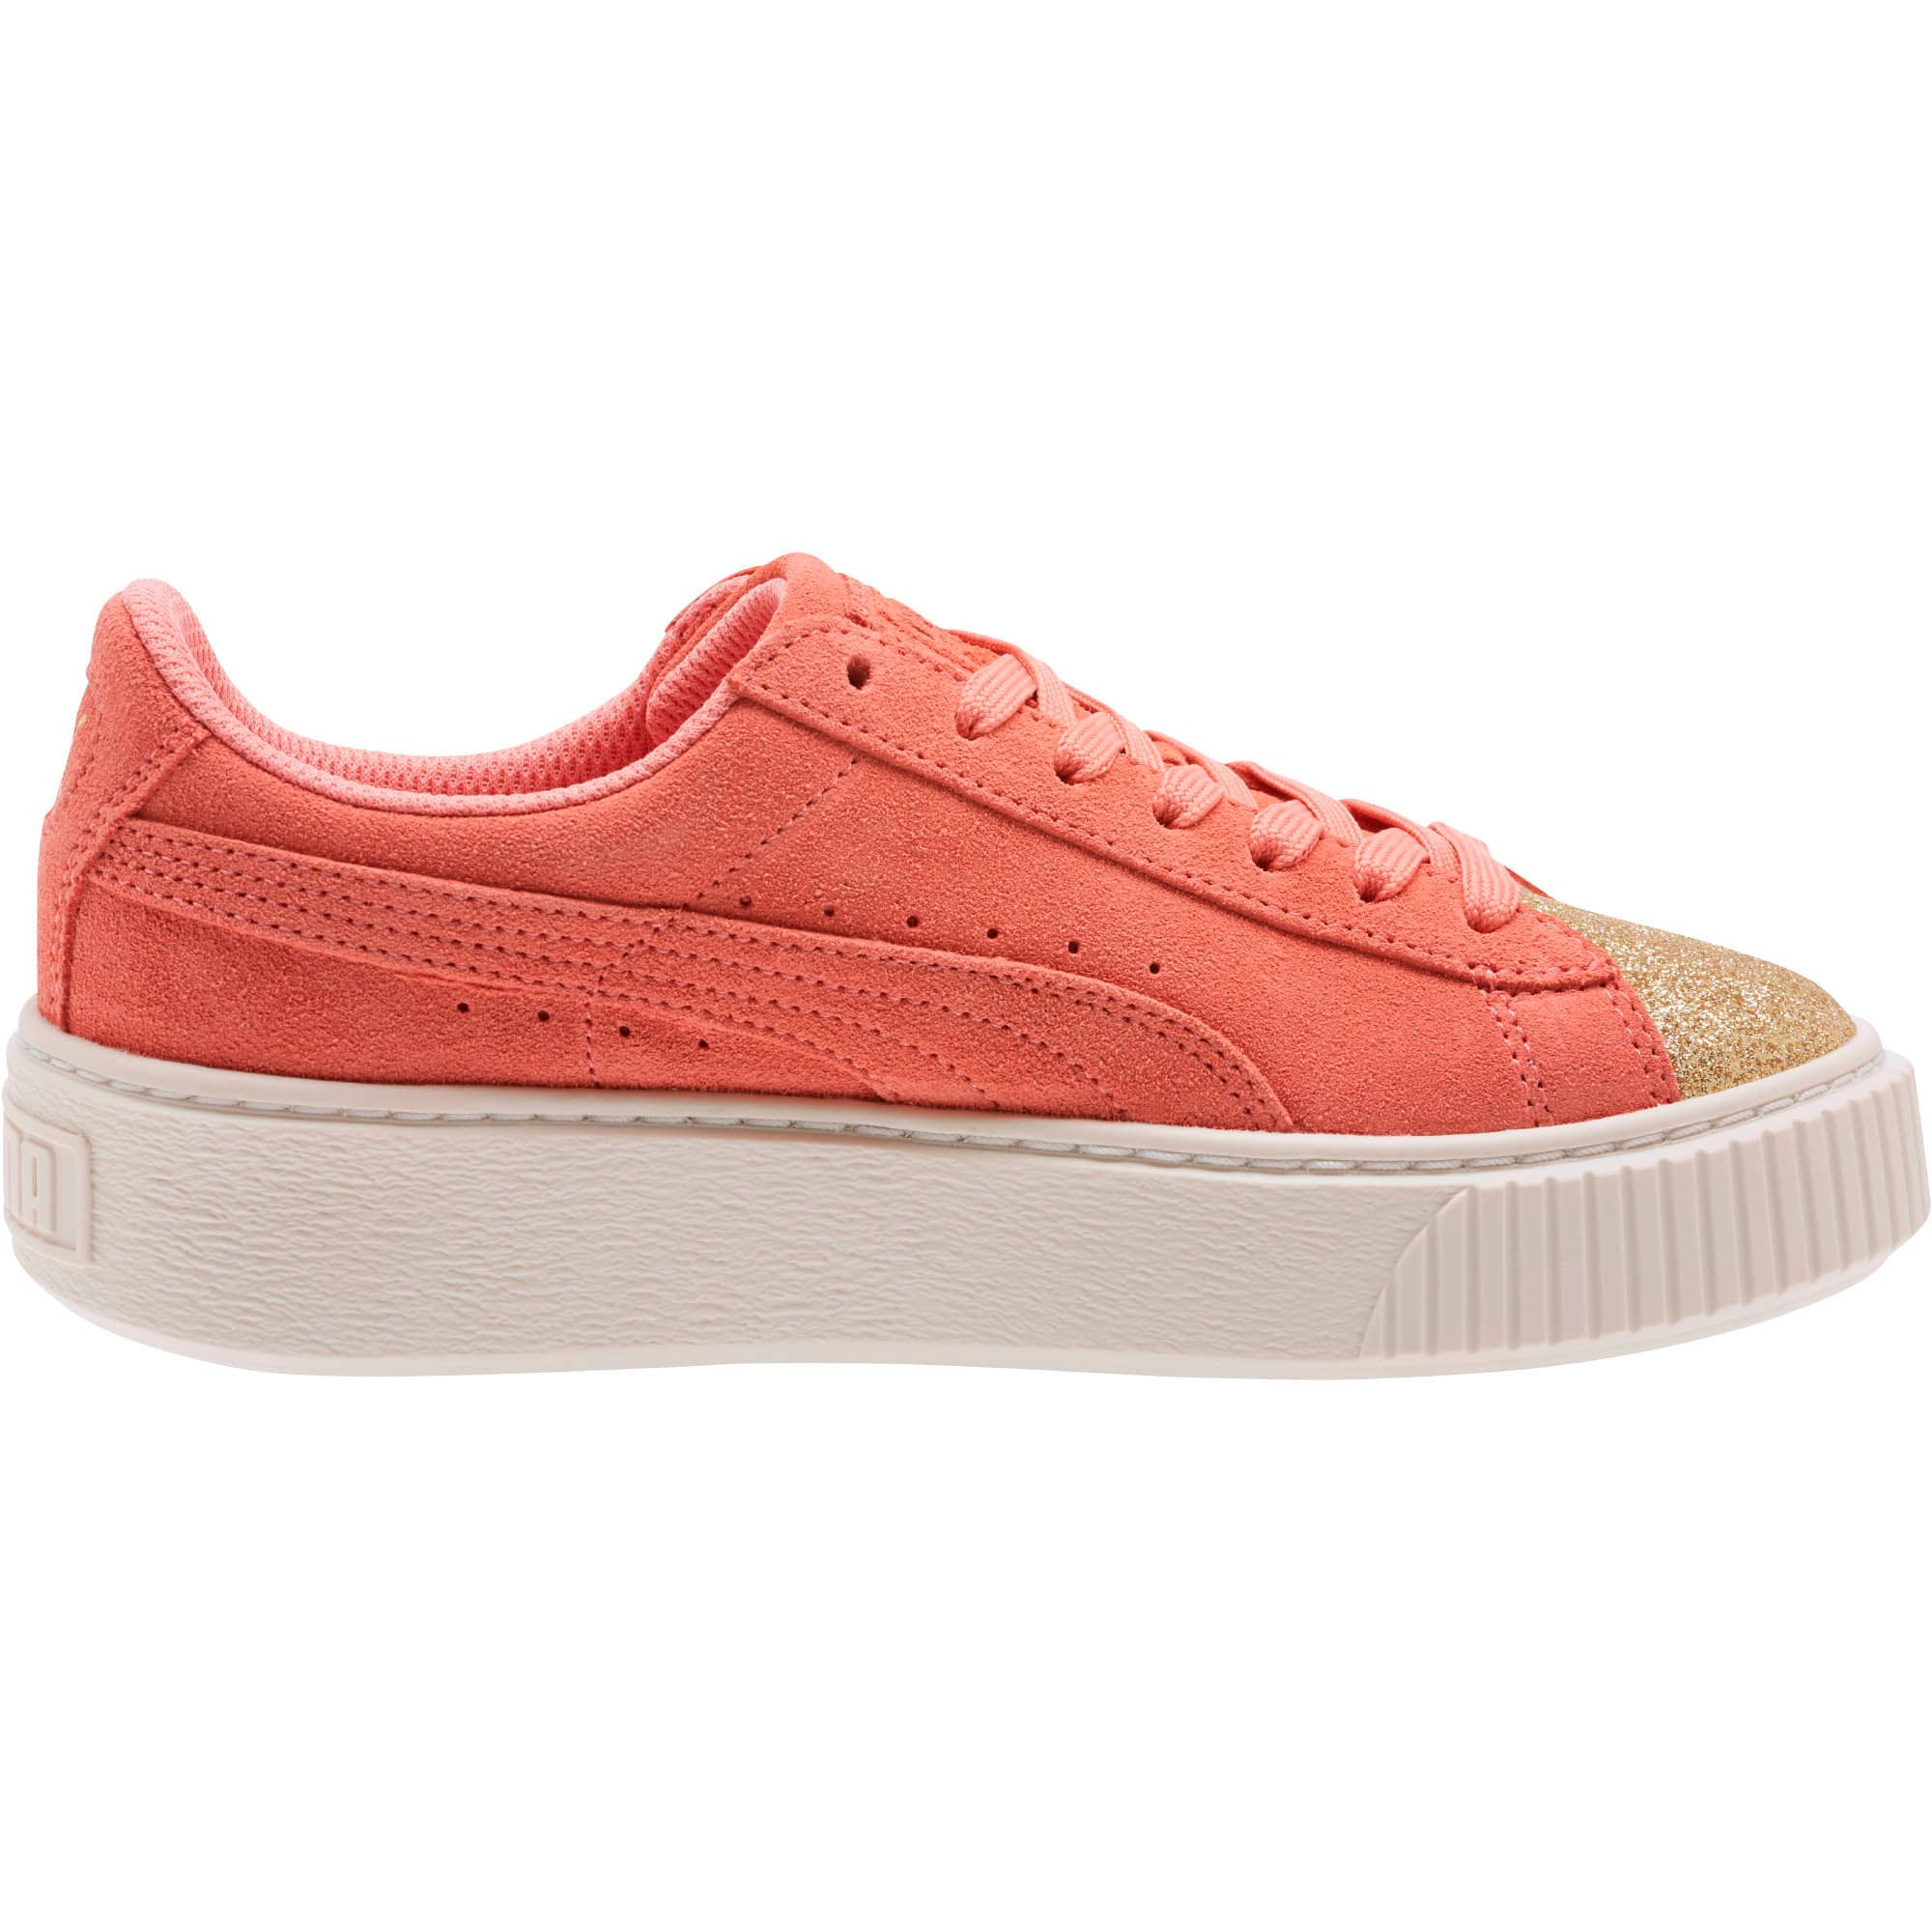 Thumbnail 3 of Suede Platform Glam Girls' Sneakers, Puma Team Gold-Shell Pink, medium